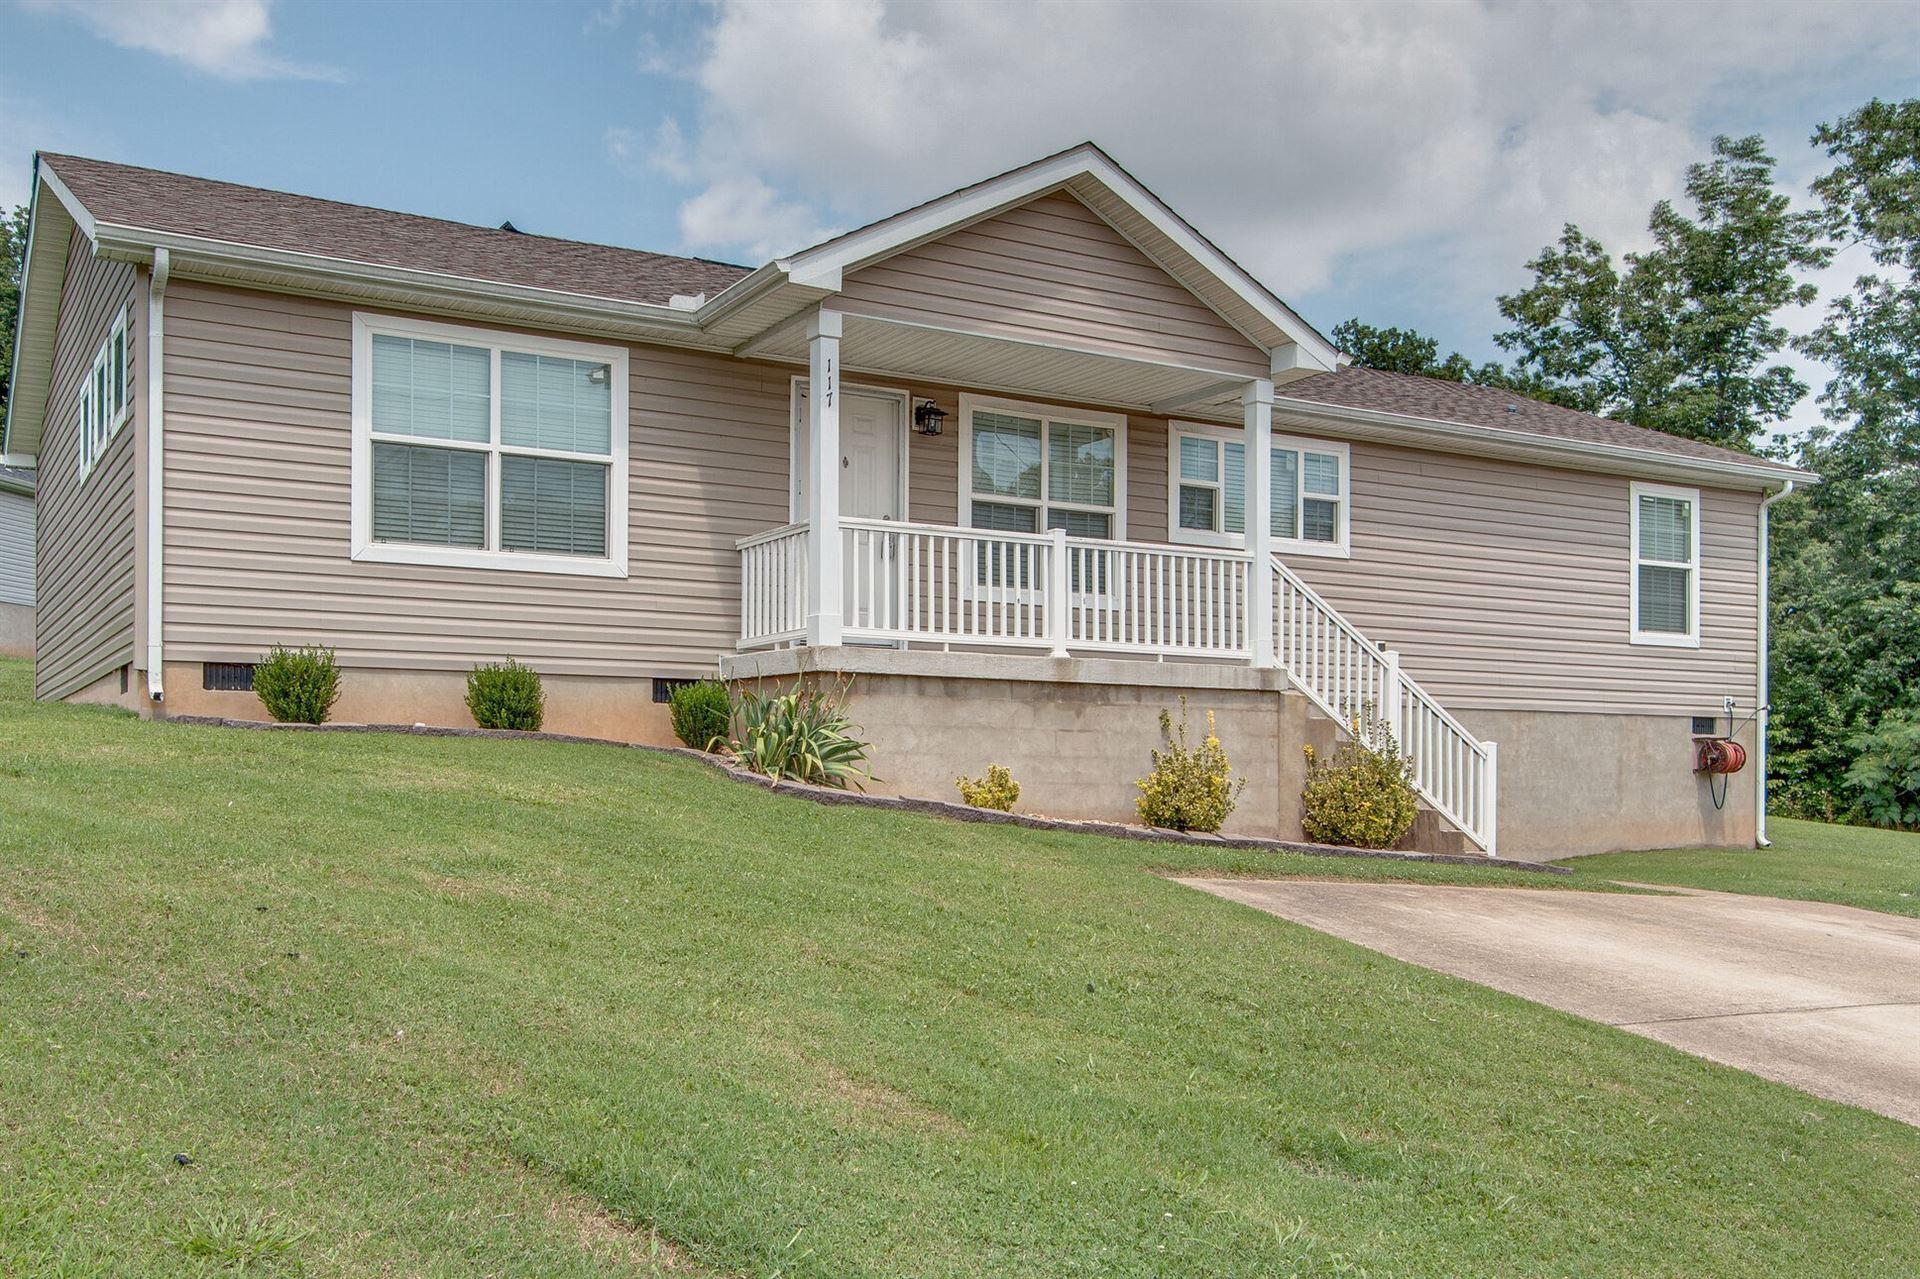 117 Westwind Ct, Columbia, TN 38401 - MLS#: 2274999